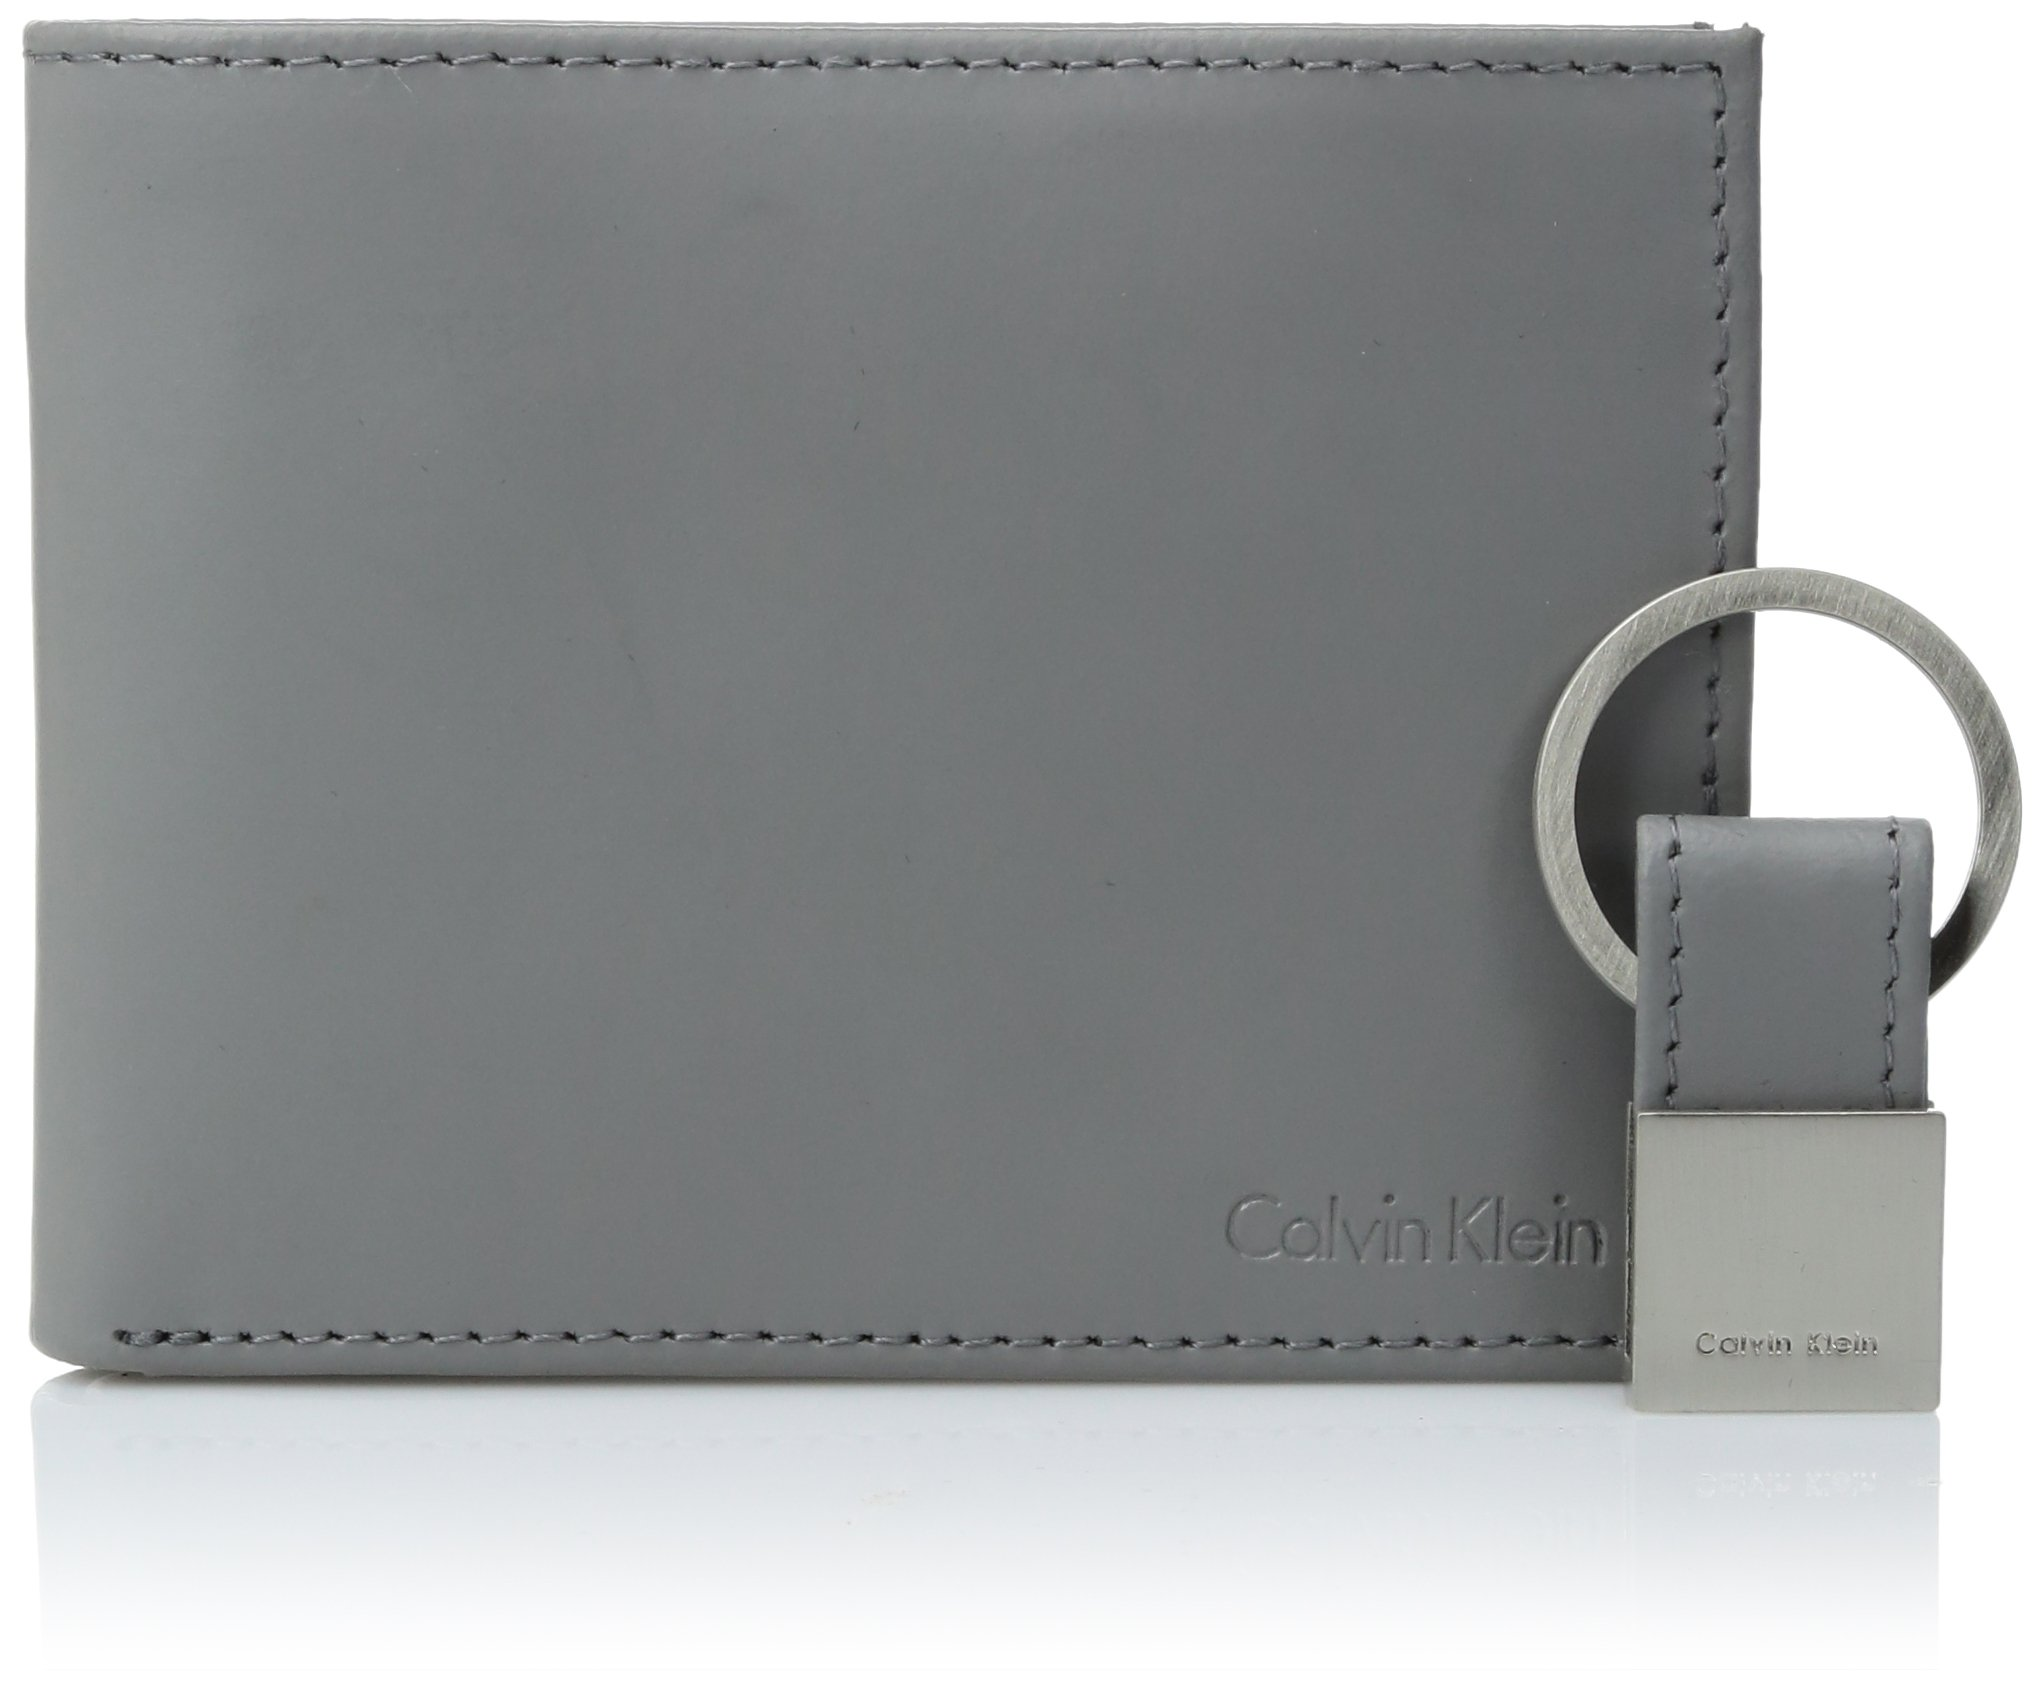 Calvin Klein Men's Calvin Klein Leather Bifold Wallet With Key Fob, Cool Gray, One Size